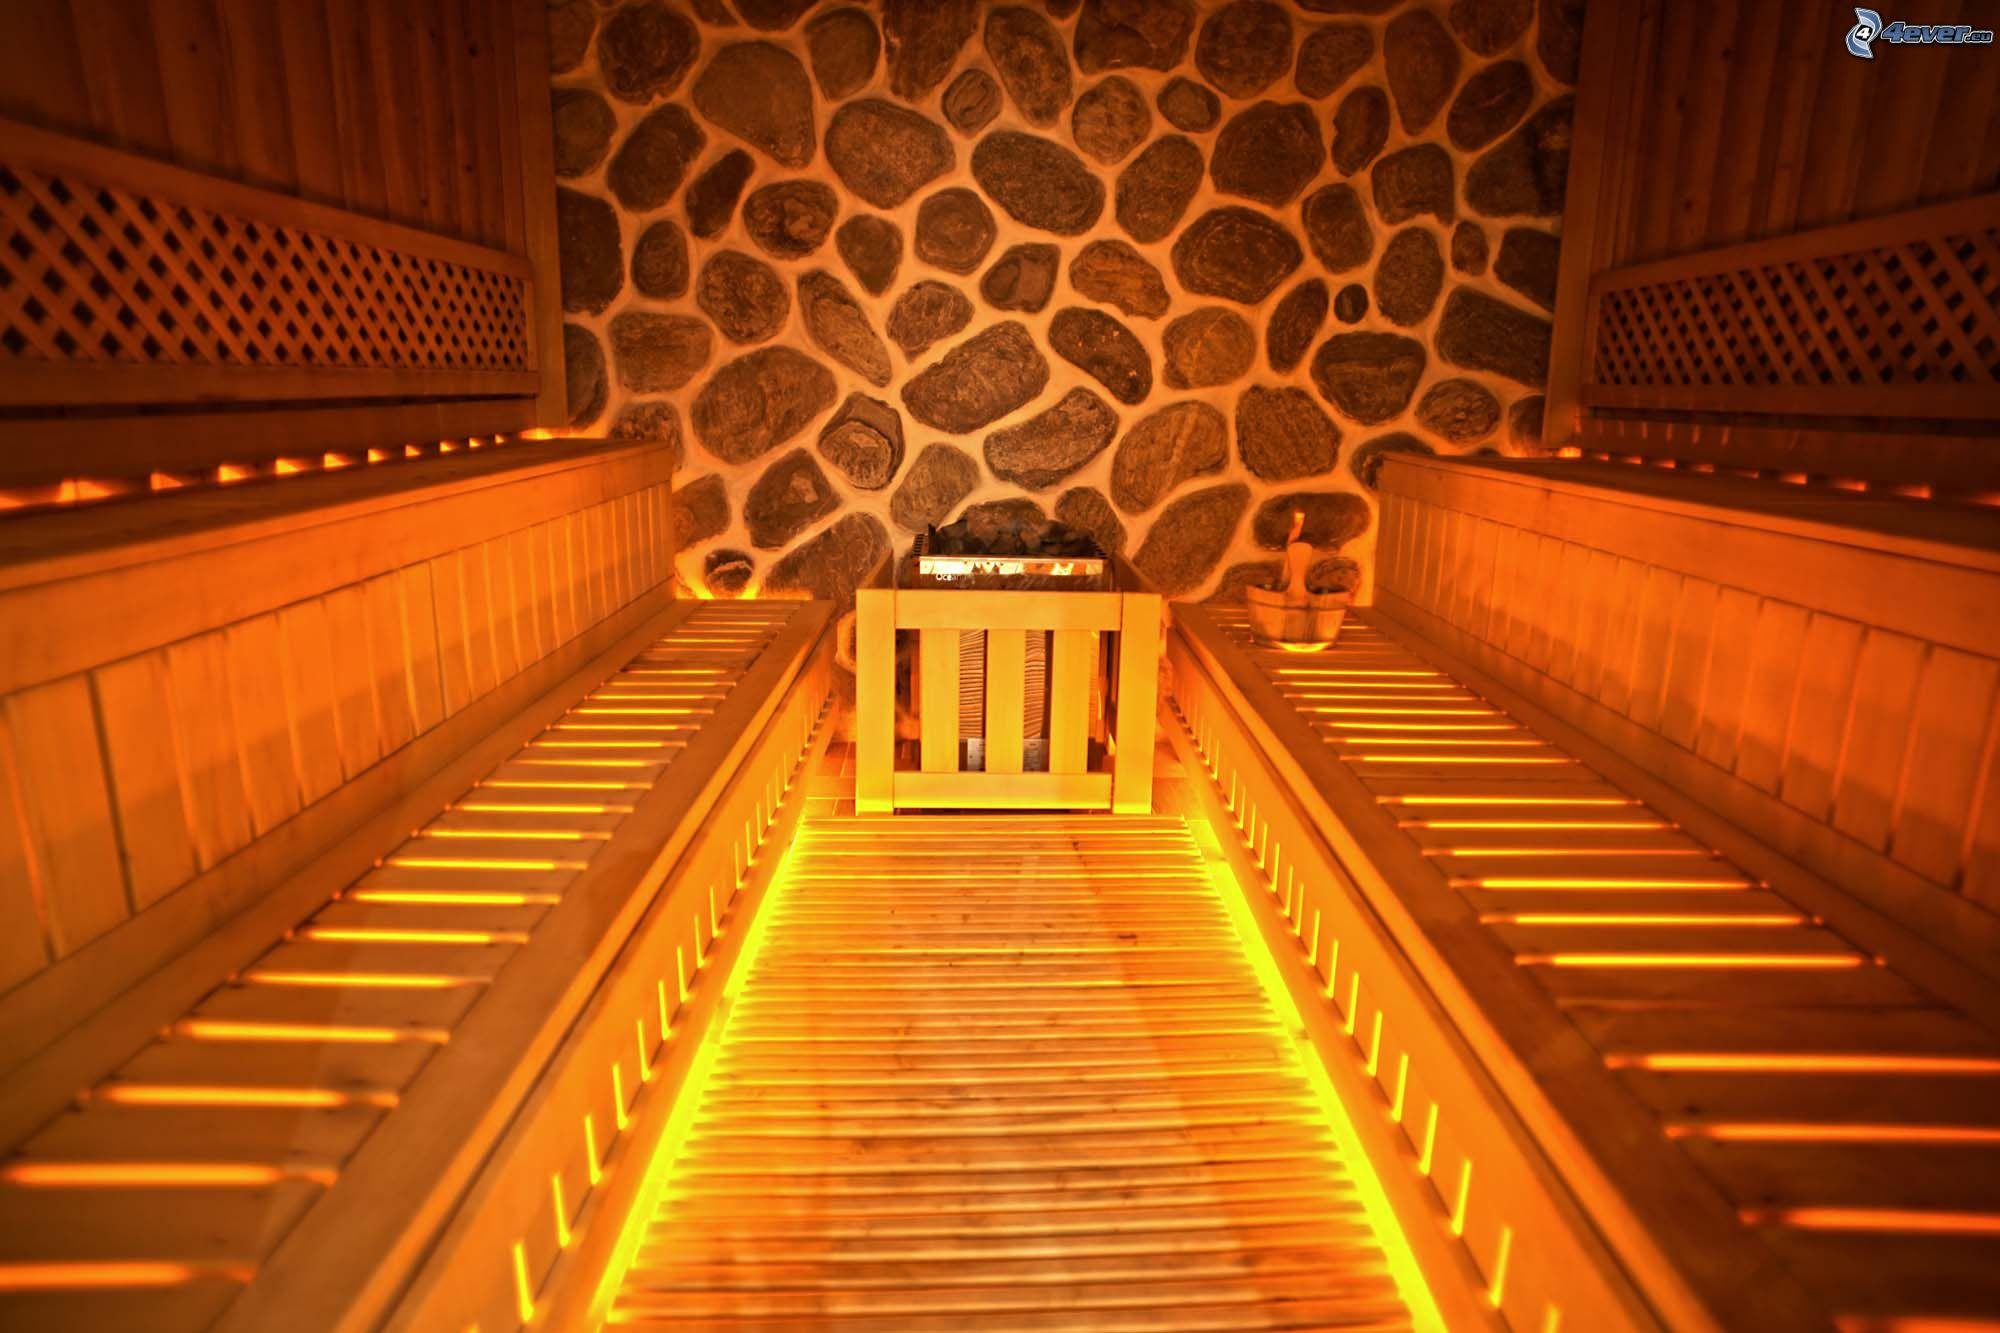 Simple good tlcharger luimage saune da casa prezzi xpx tlcharger luimage with saune prezzi with - Prezzi sauna per casa ...